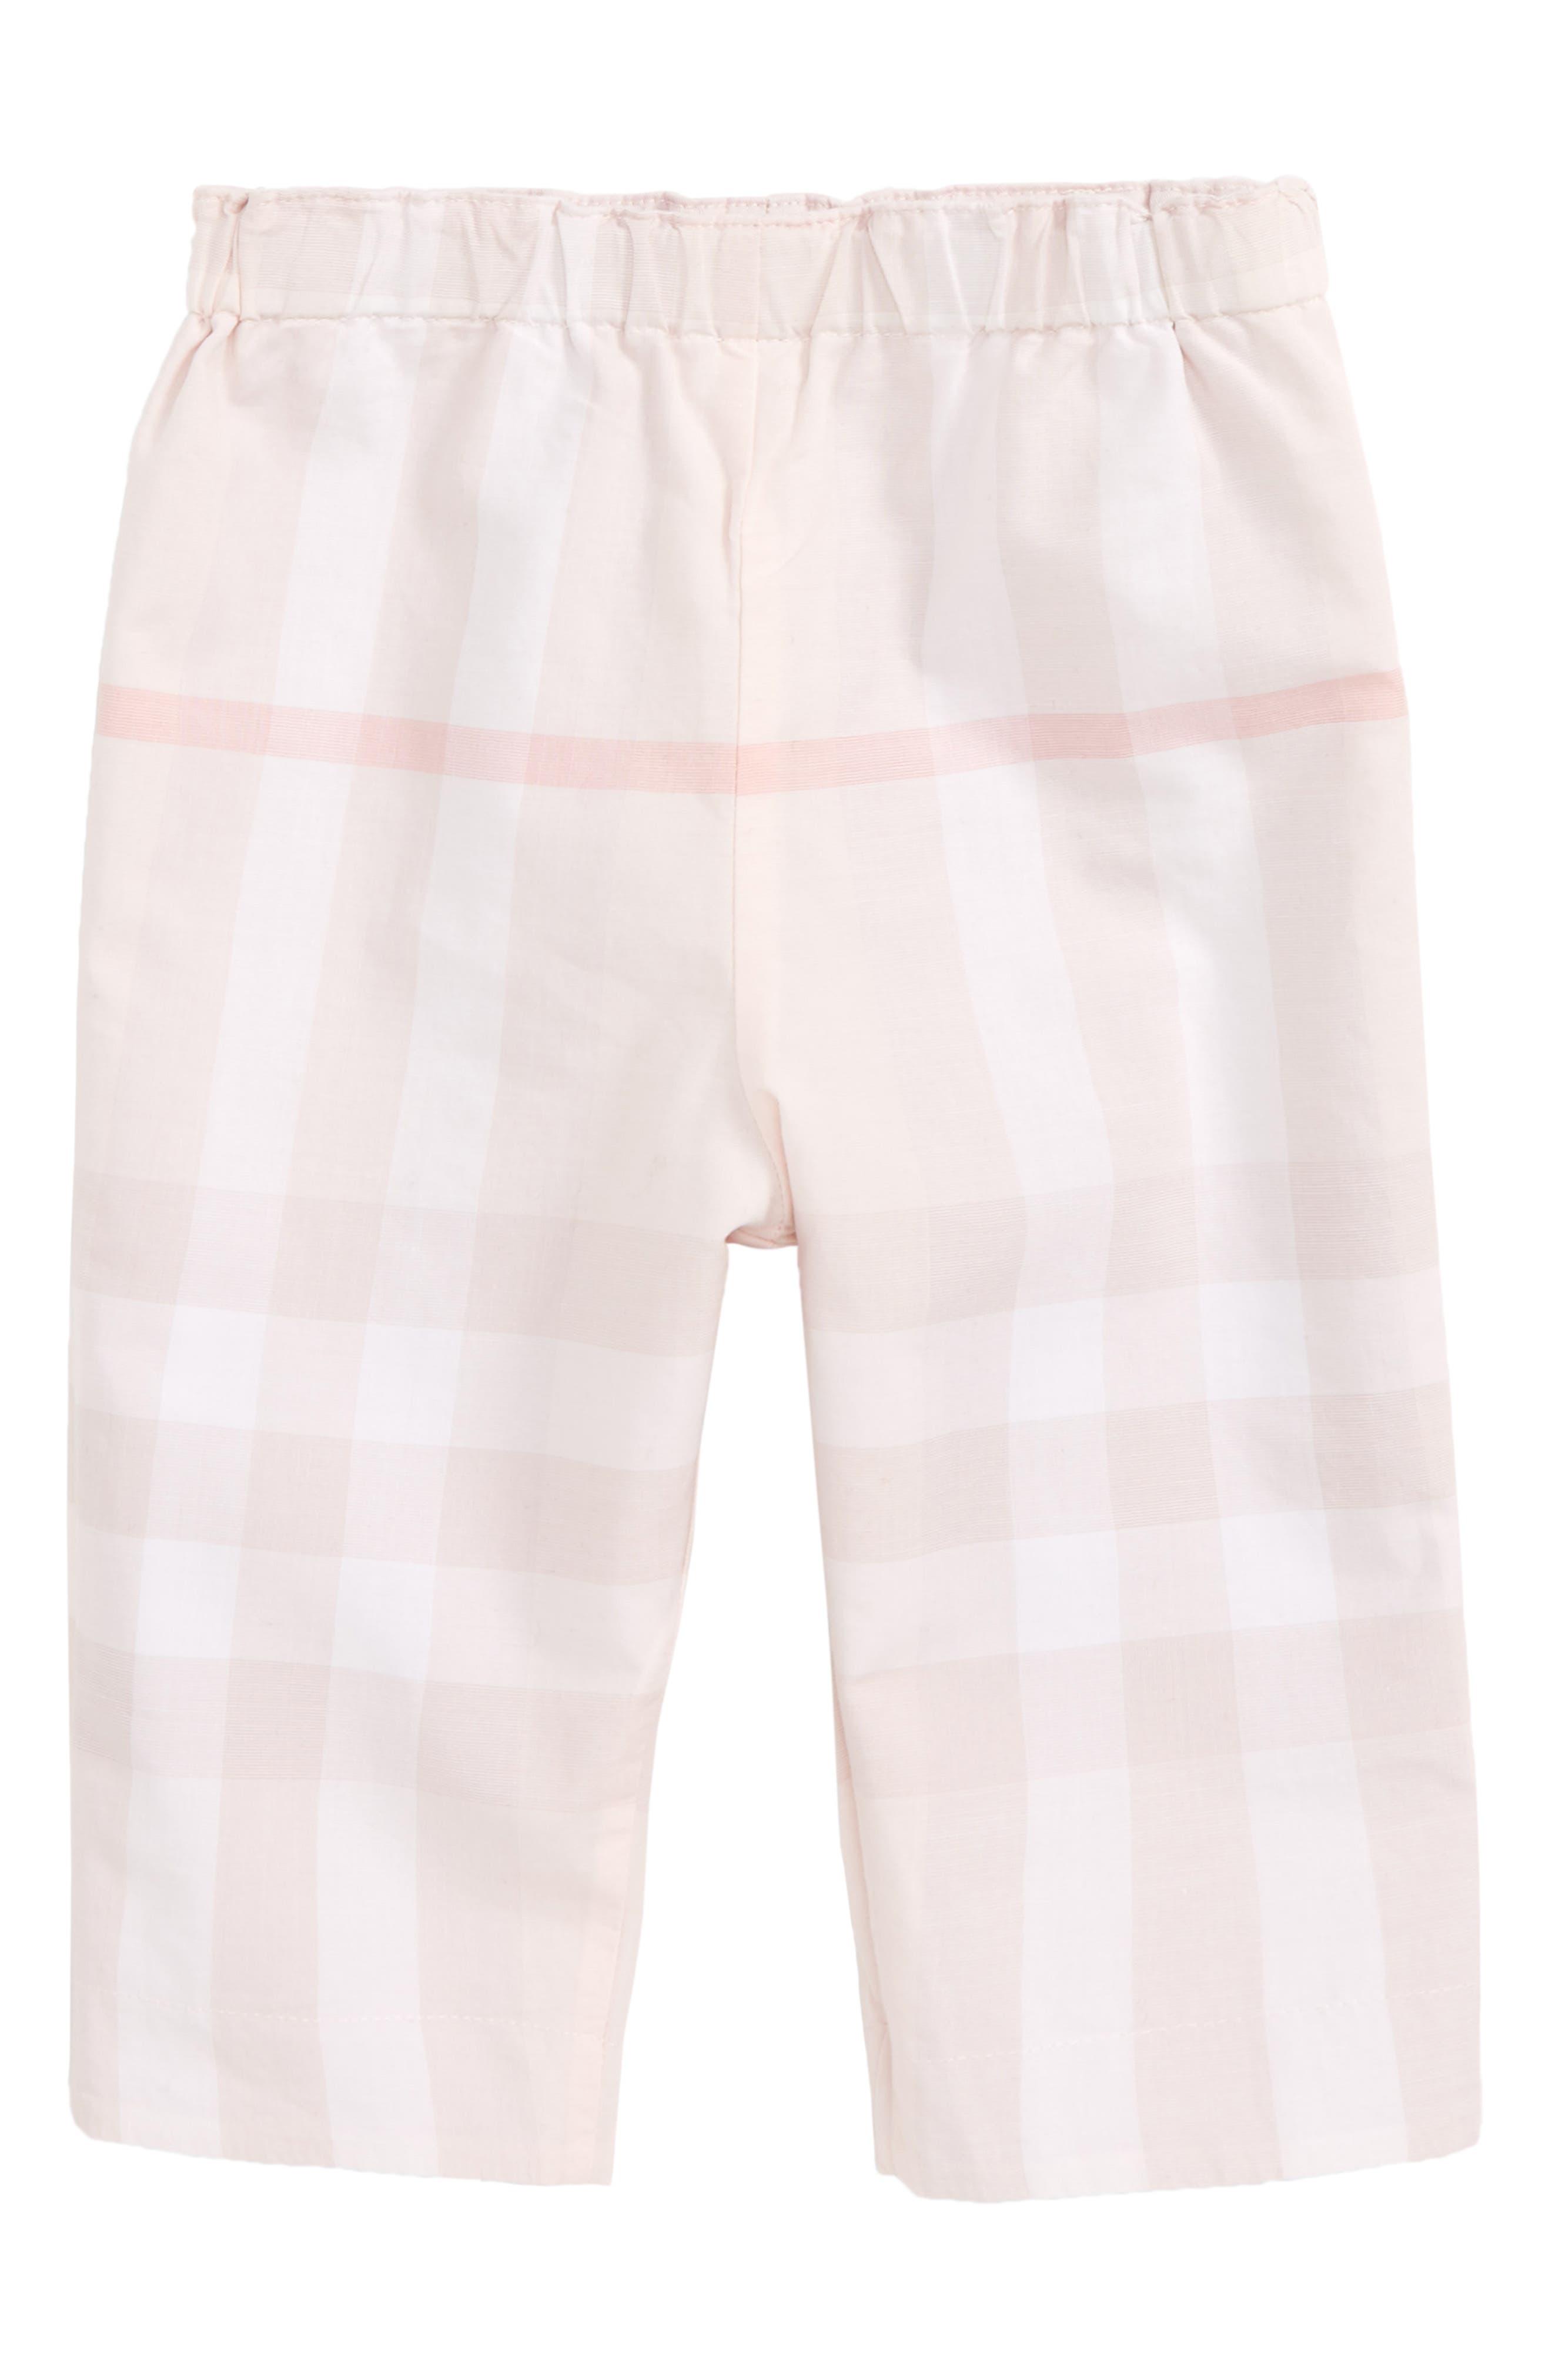 Darcy Pants,                             Alternate thumbnail 2, color,                             685